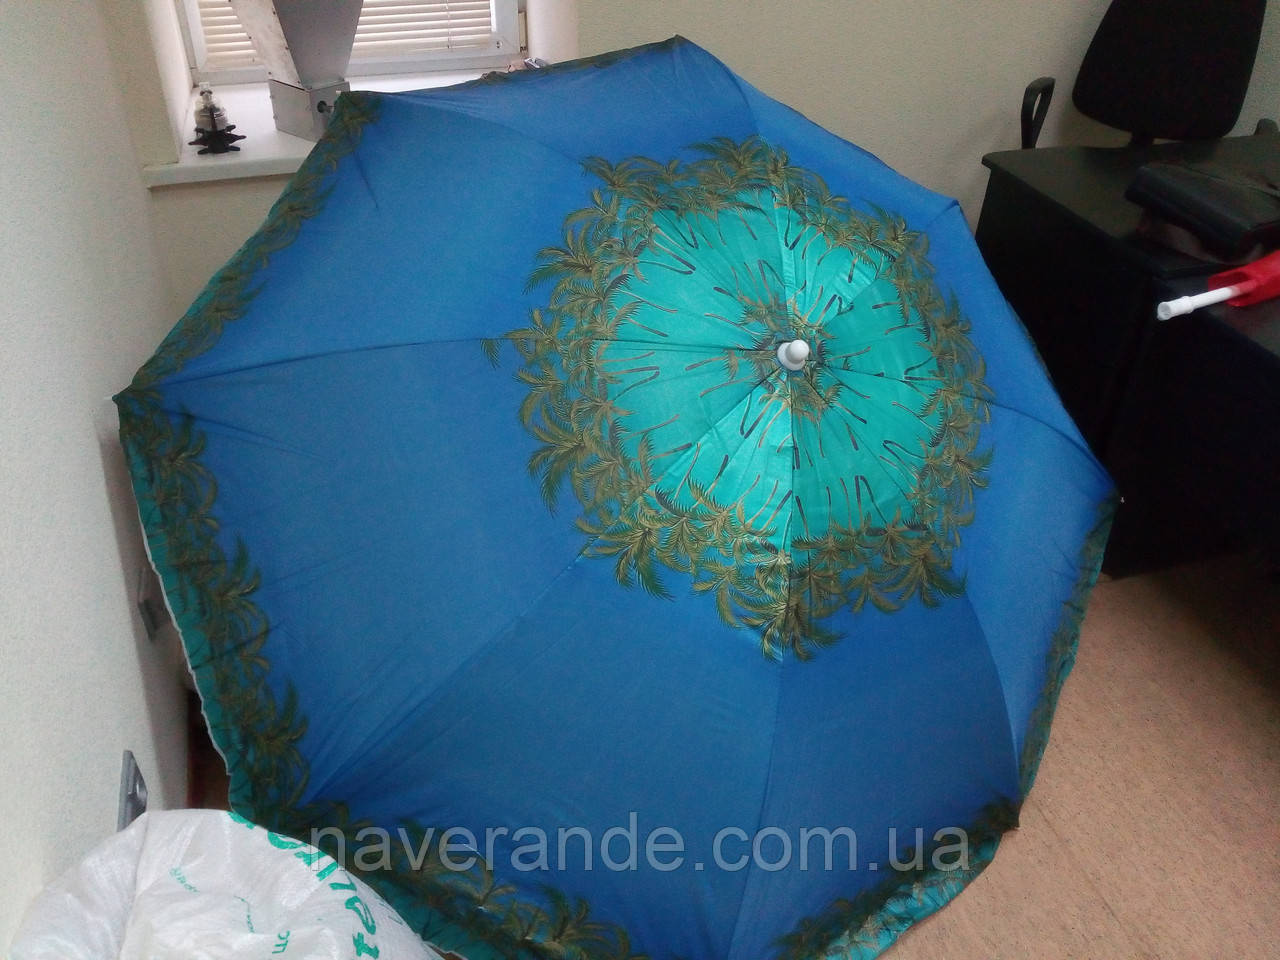 Пляжный зонт от солнца (D1,8 м)